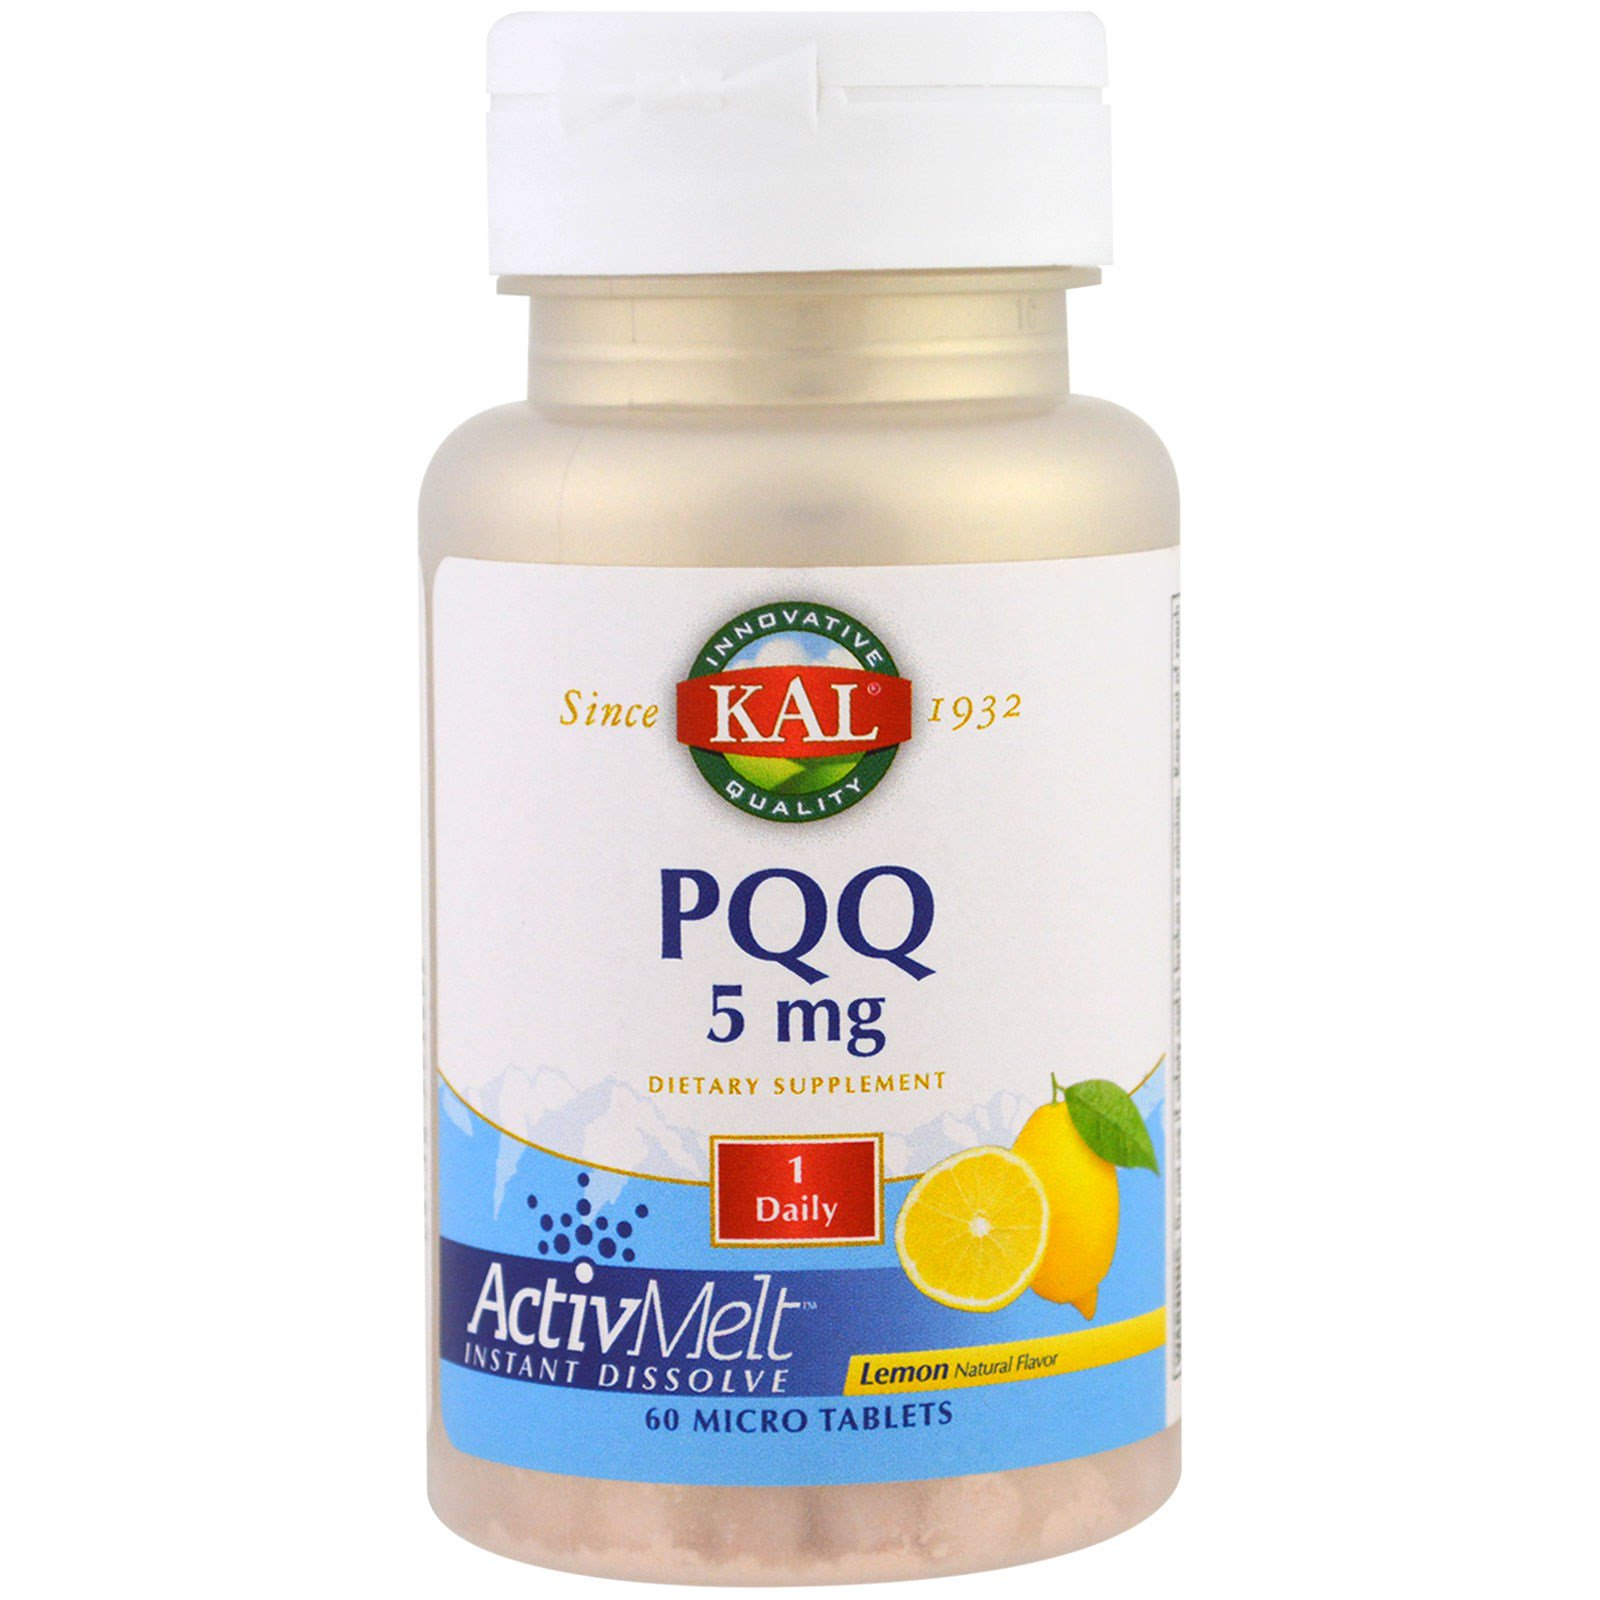 KAL, PQQ (пирролохинолинхинон) с лимонным вкусом, 5 мг, 60 микротаблеток